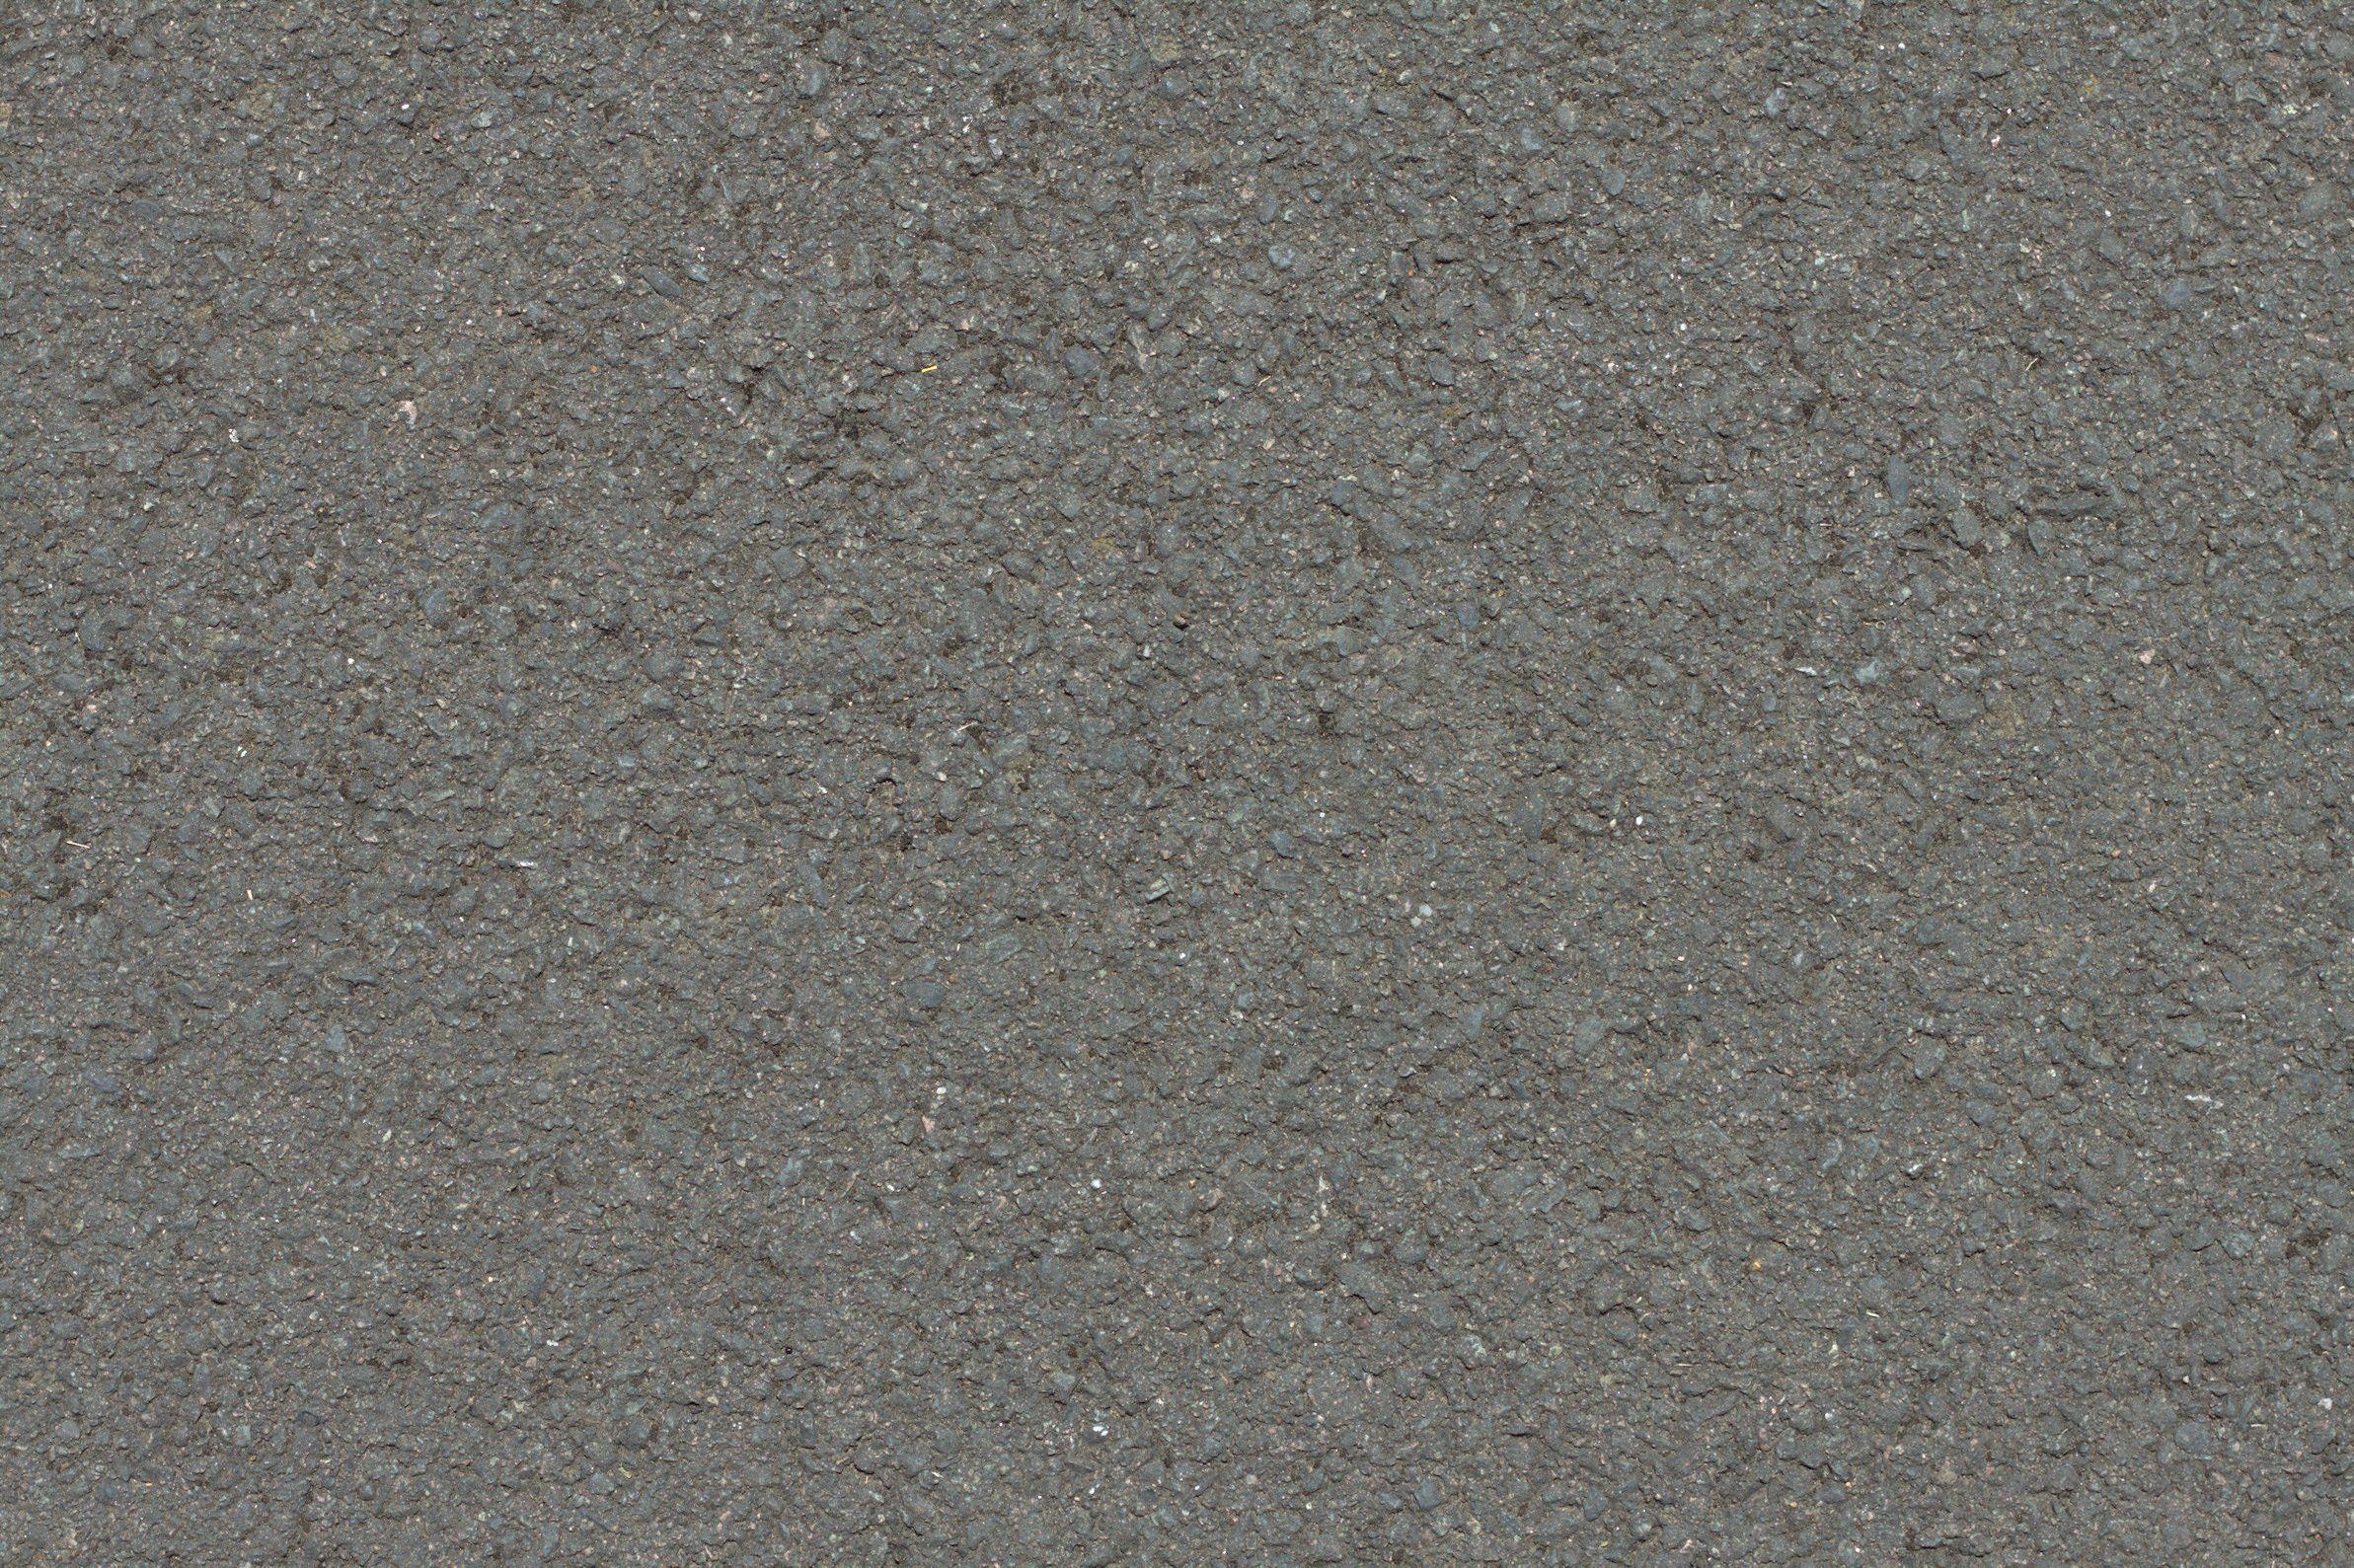 Road Texture Seamless Version Road Texture Asphalt Texture Texture Water